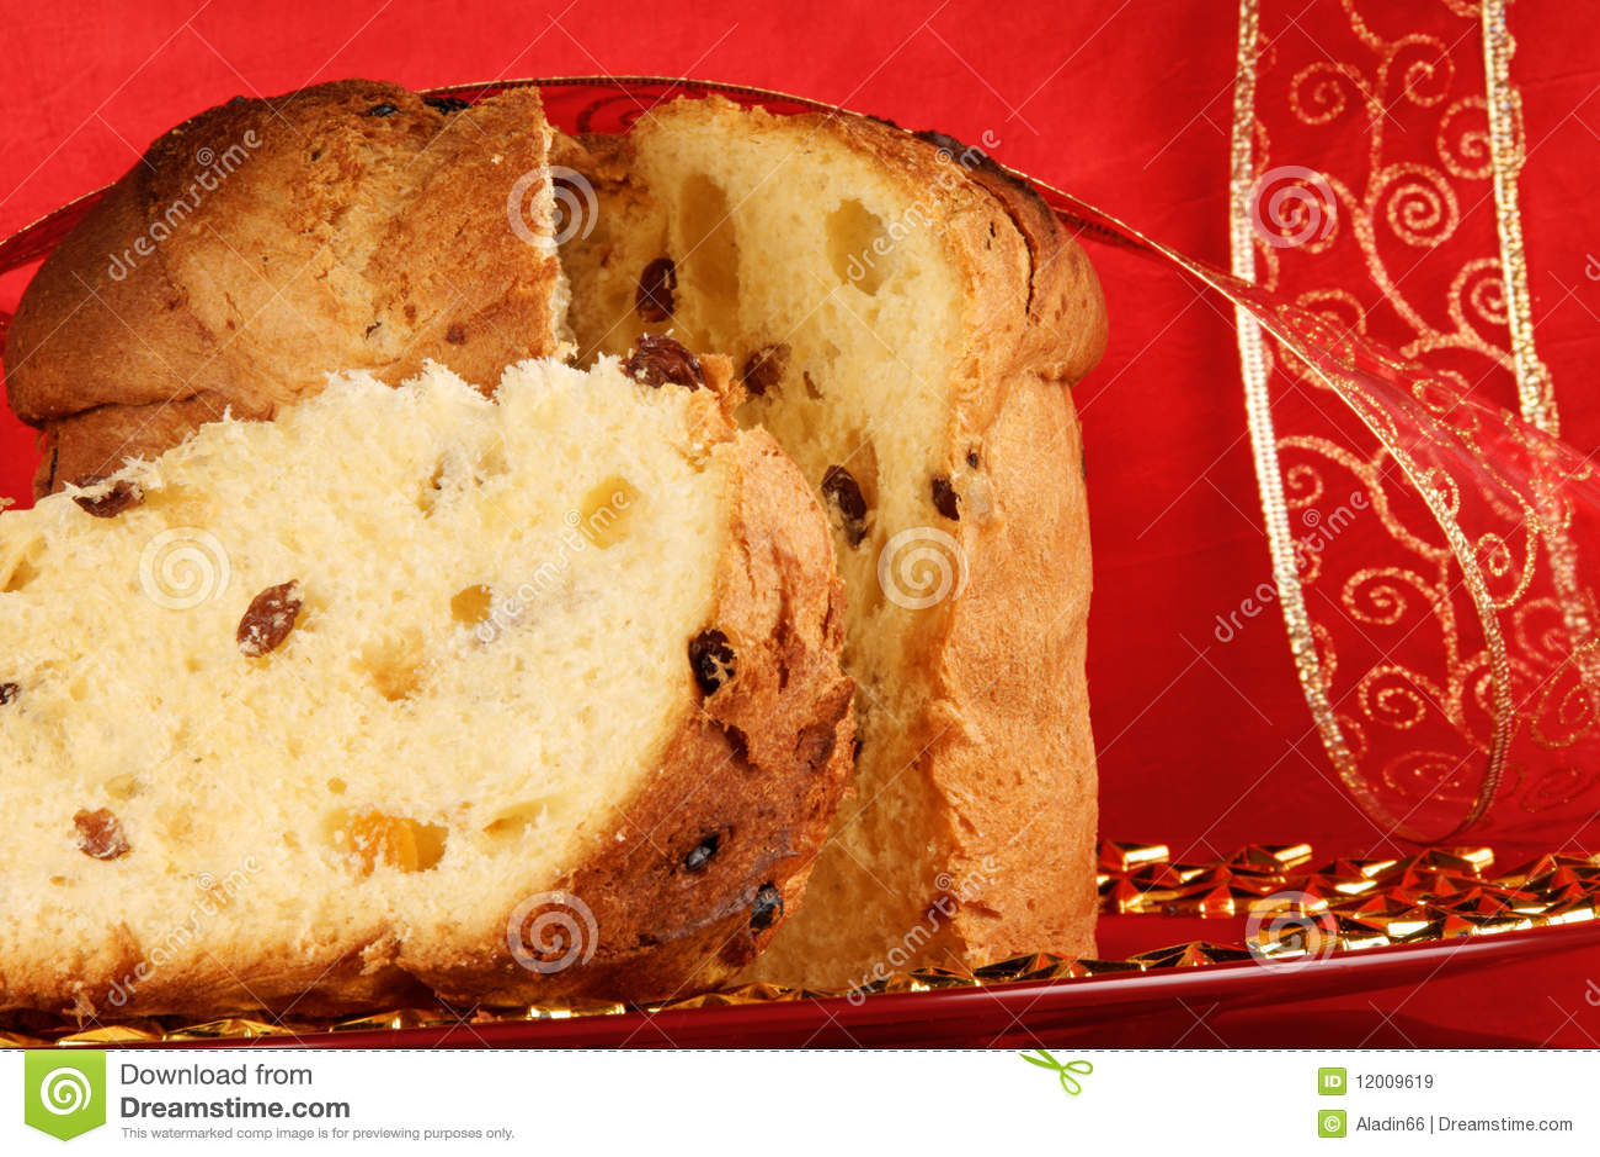 Italian Fruit Cake Recipes: Panettone The Italian Christmas Cake Royalty Free Stock